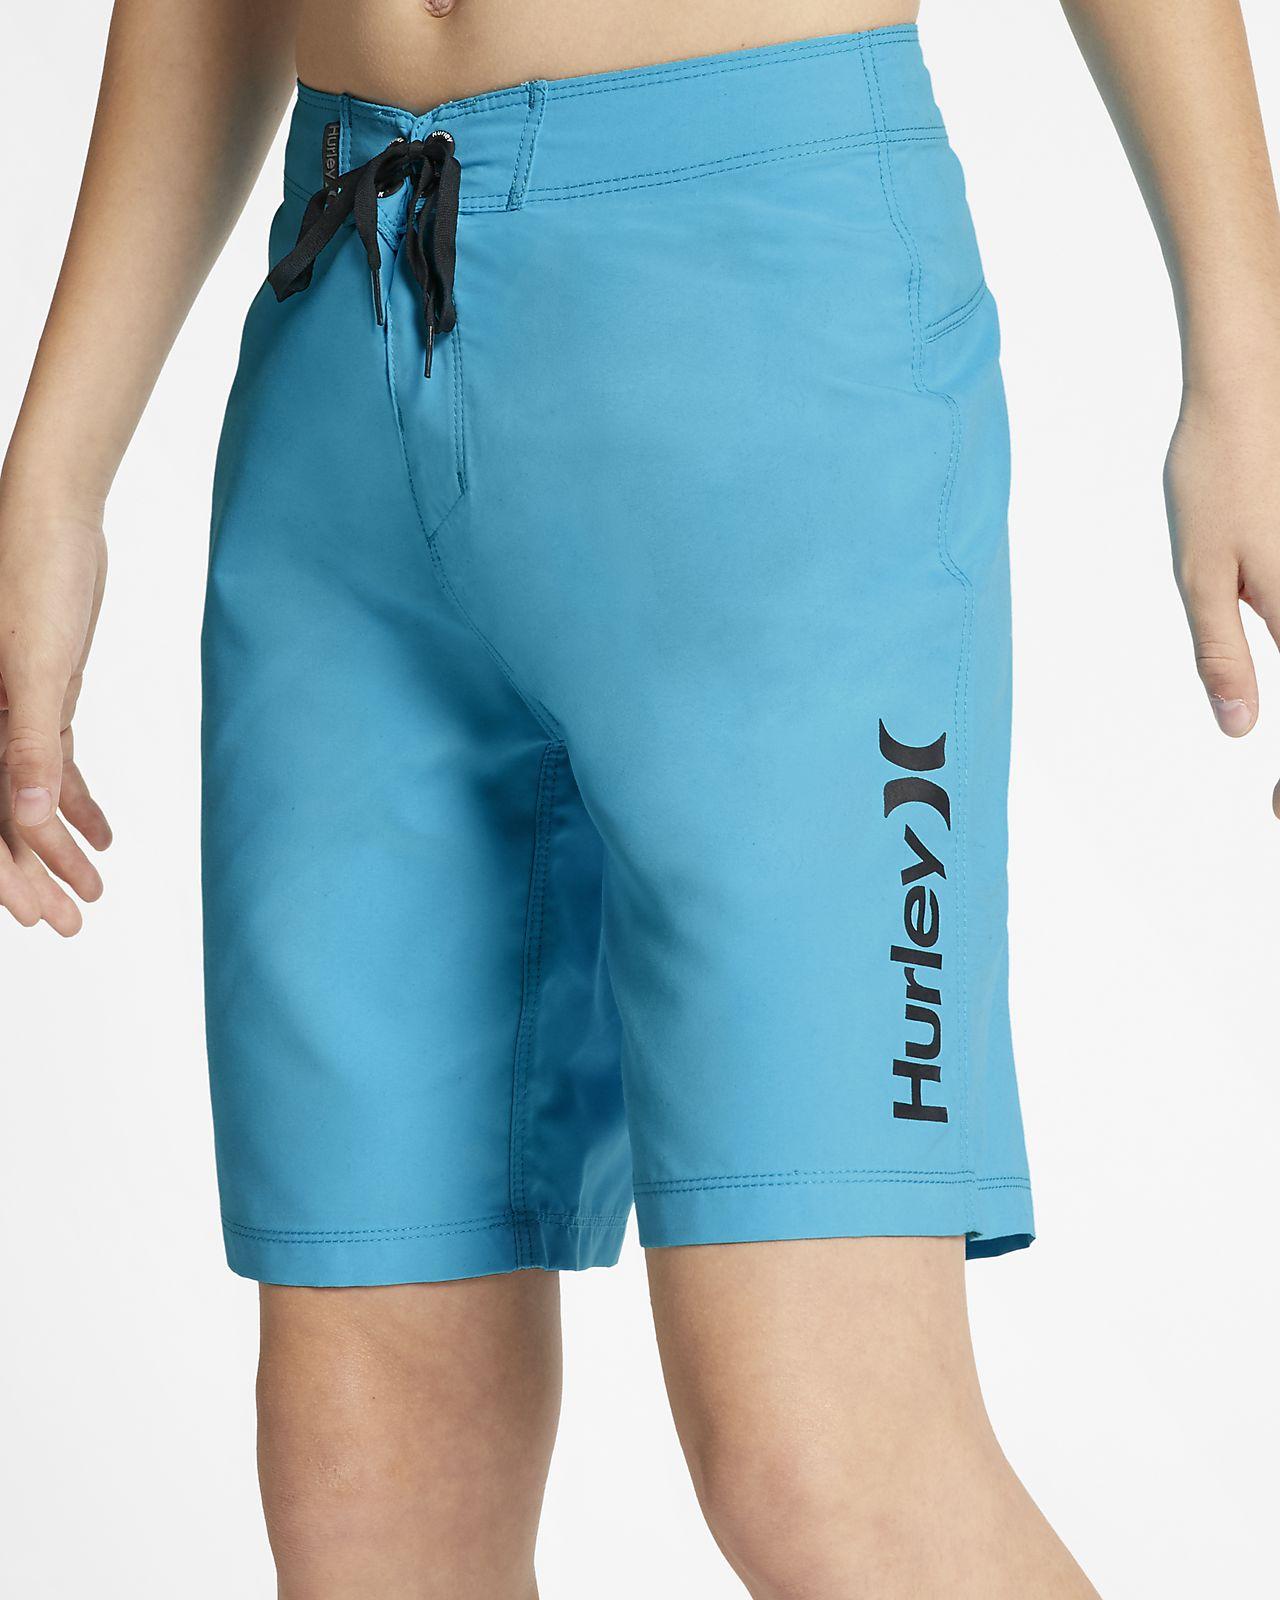 Shorts de playa de 41 cm para niño Hurley One And Only Supersuede